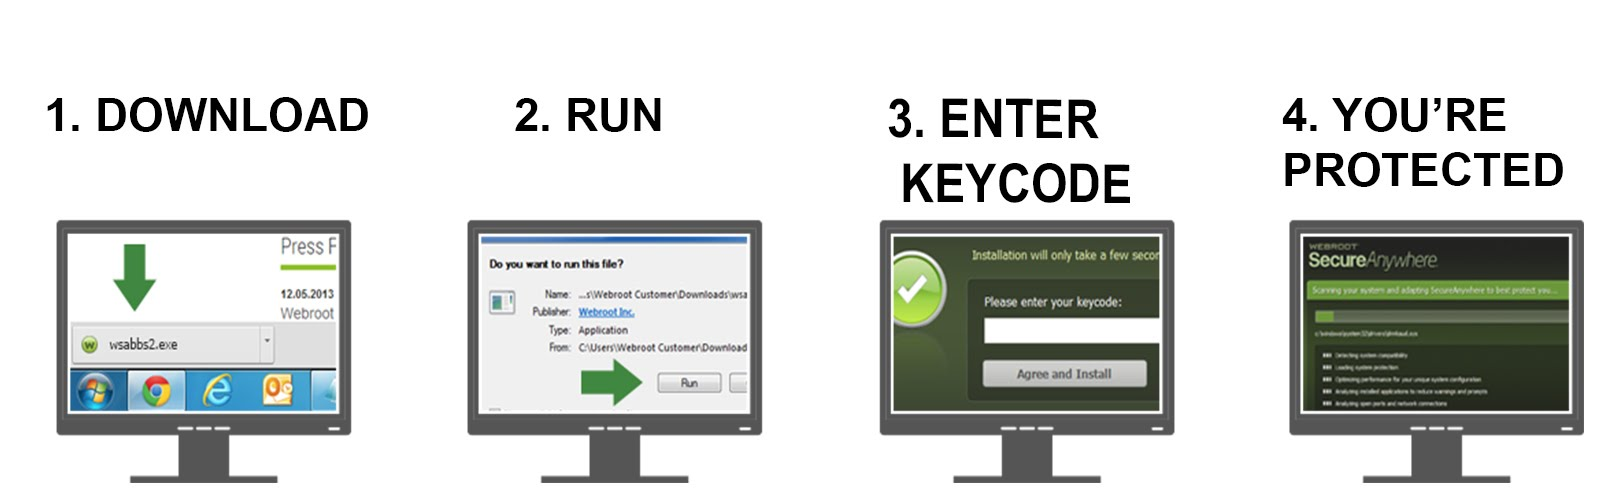 Webroot.com/safe - Enter Webroot Keycode - Download & Install on Pc